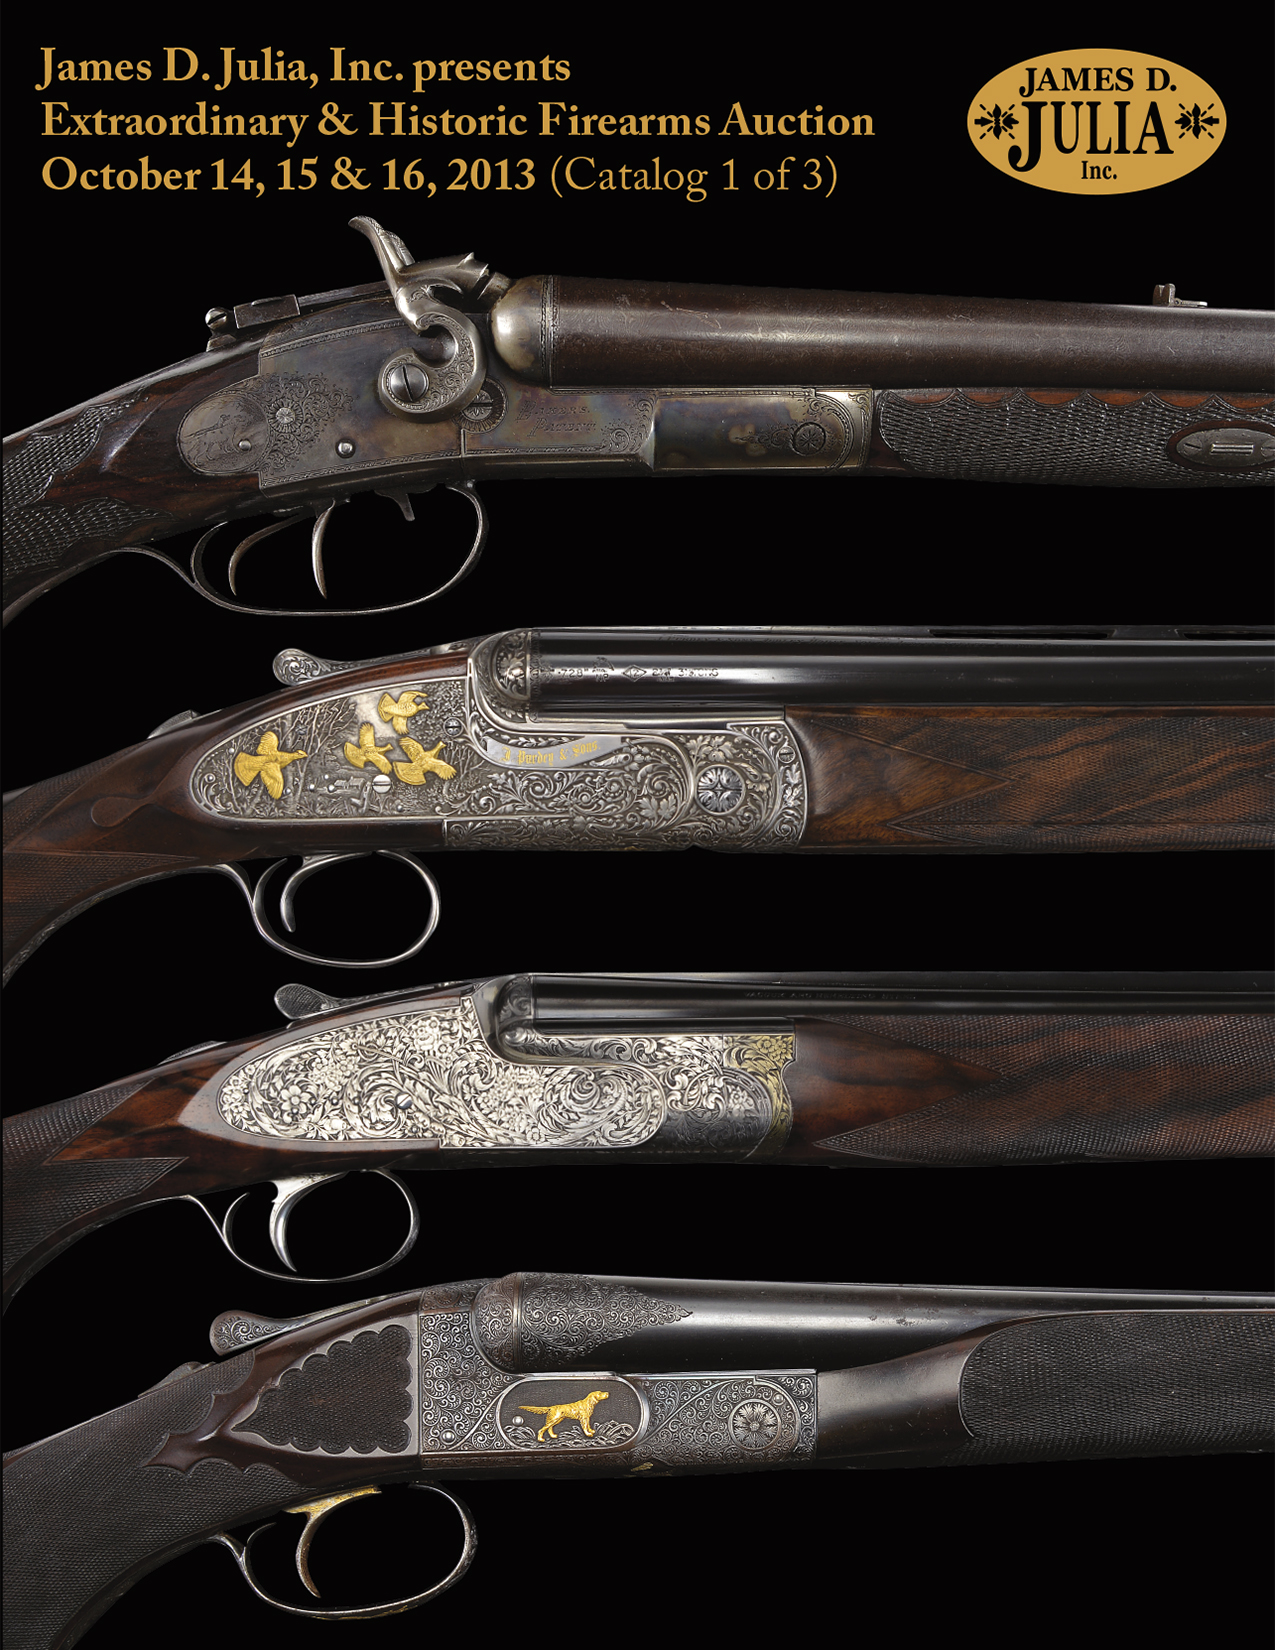 October 2013 Firearms Catalog Cover